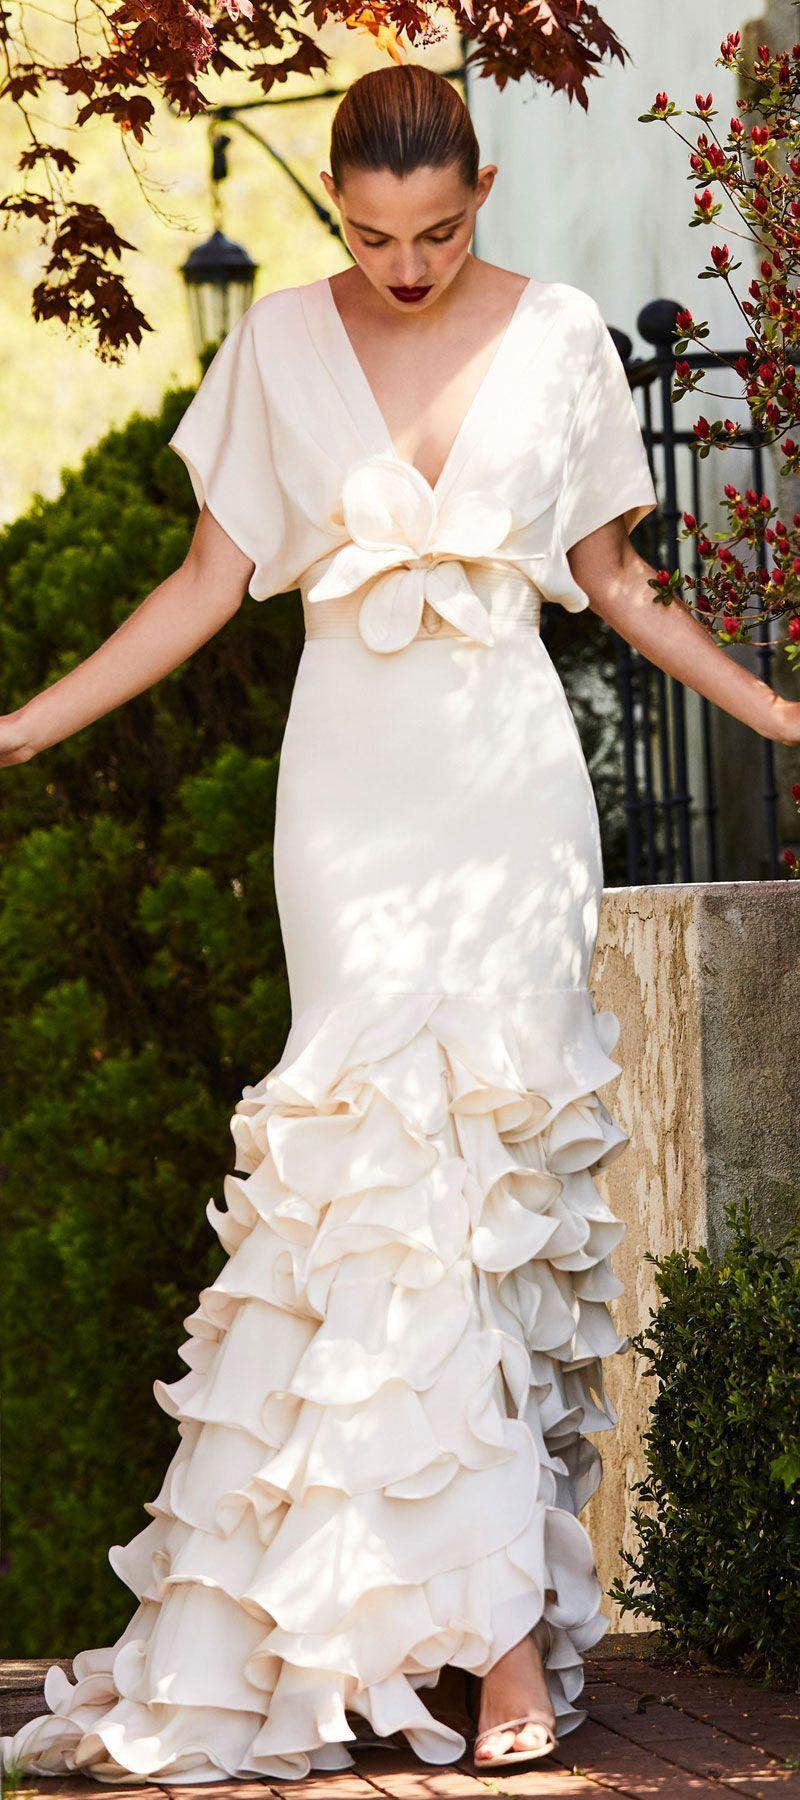 Mermaid ruffle wedding dress  Johanna Ortiz Wedding Dresses   Pinterest  Flower belt